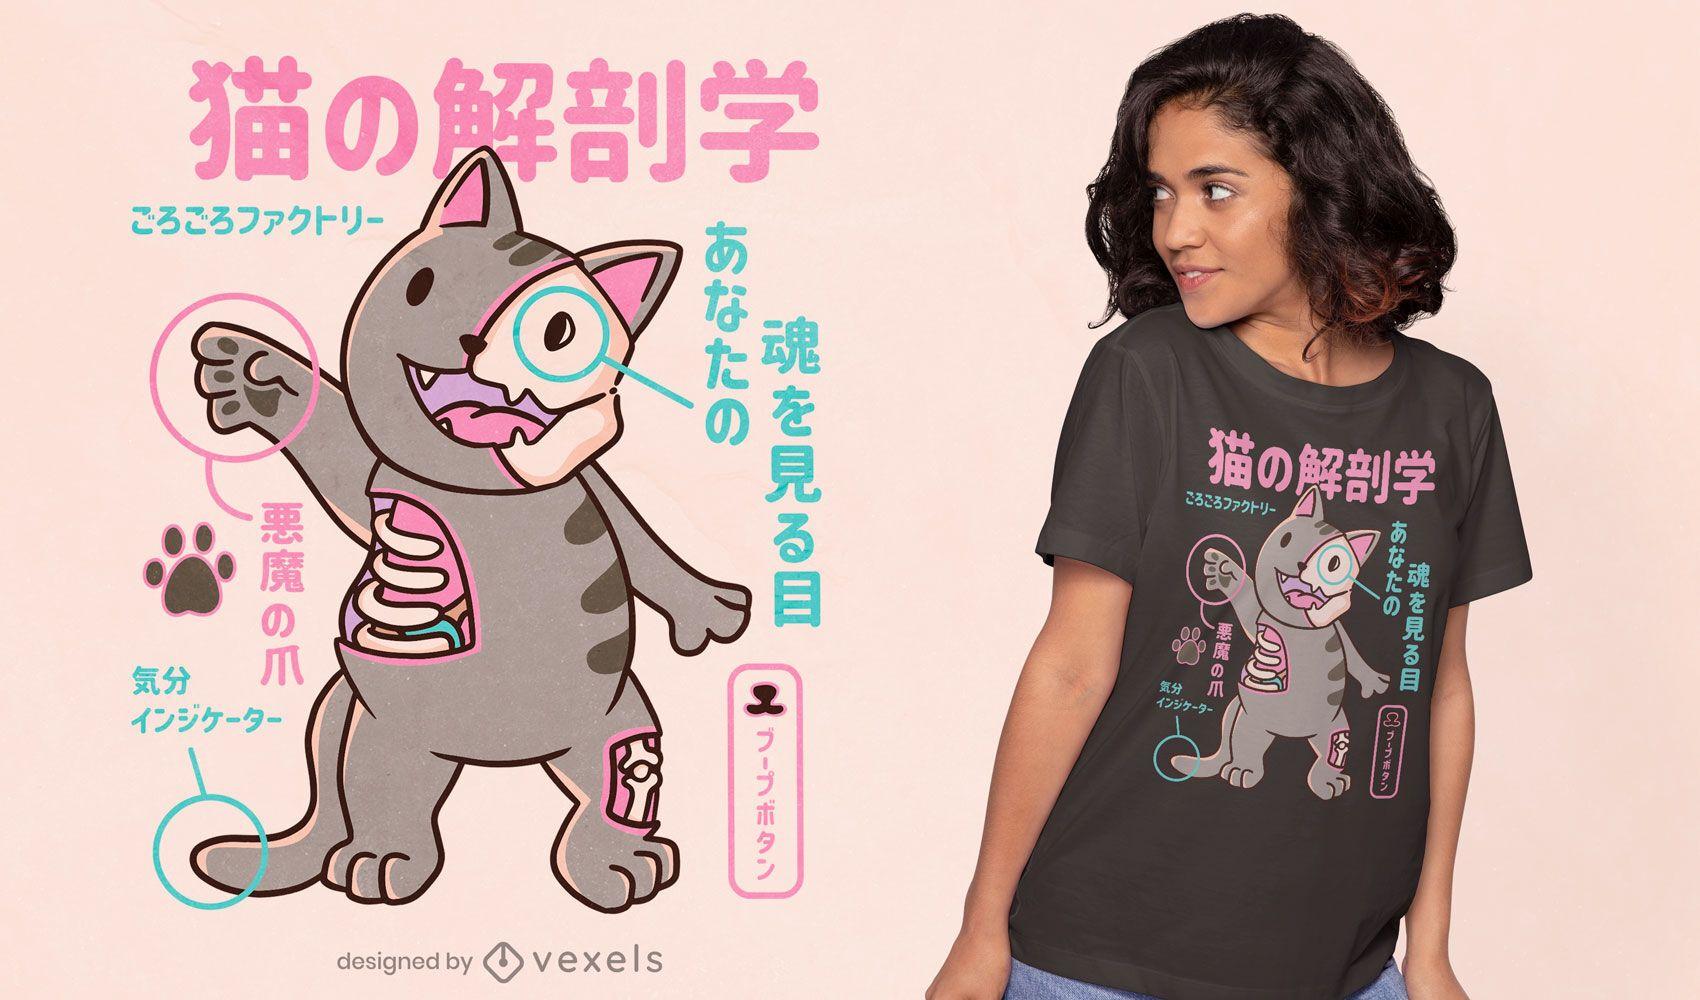 Cat anatomy japanese t-shirt design